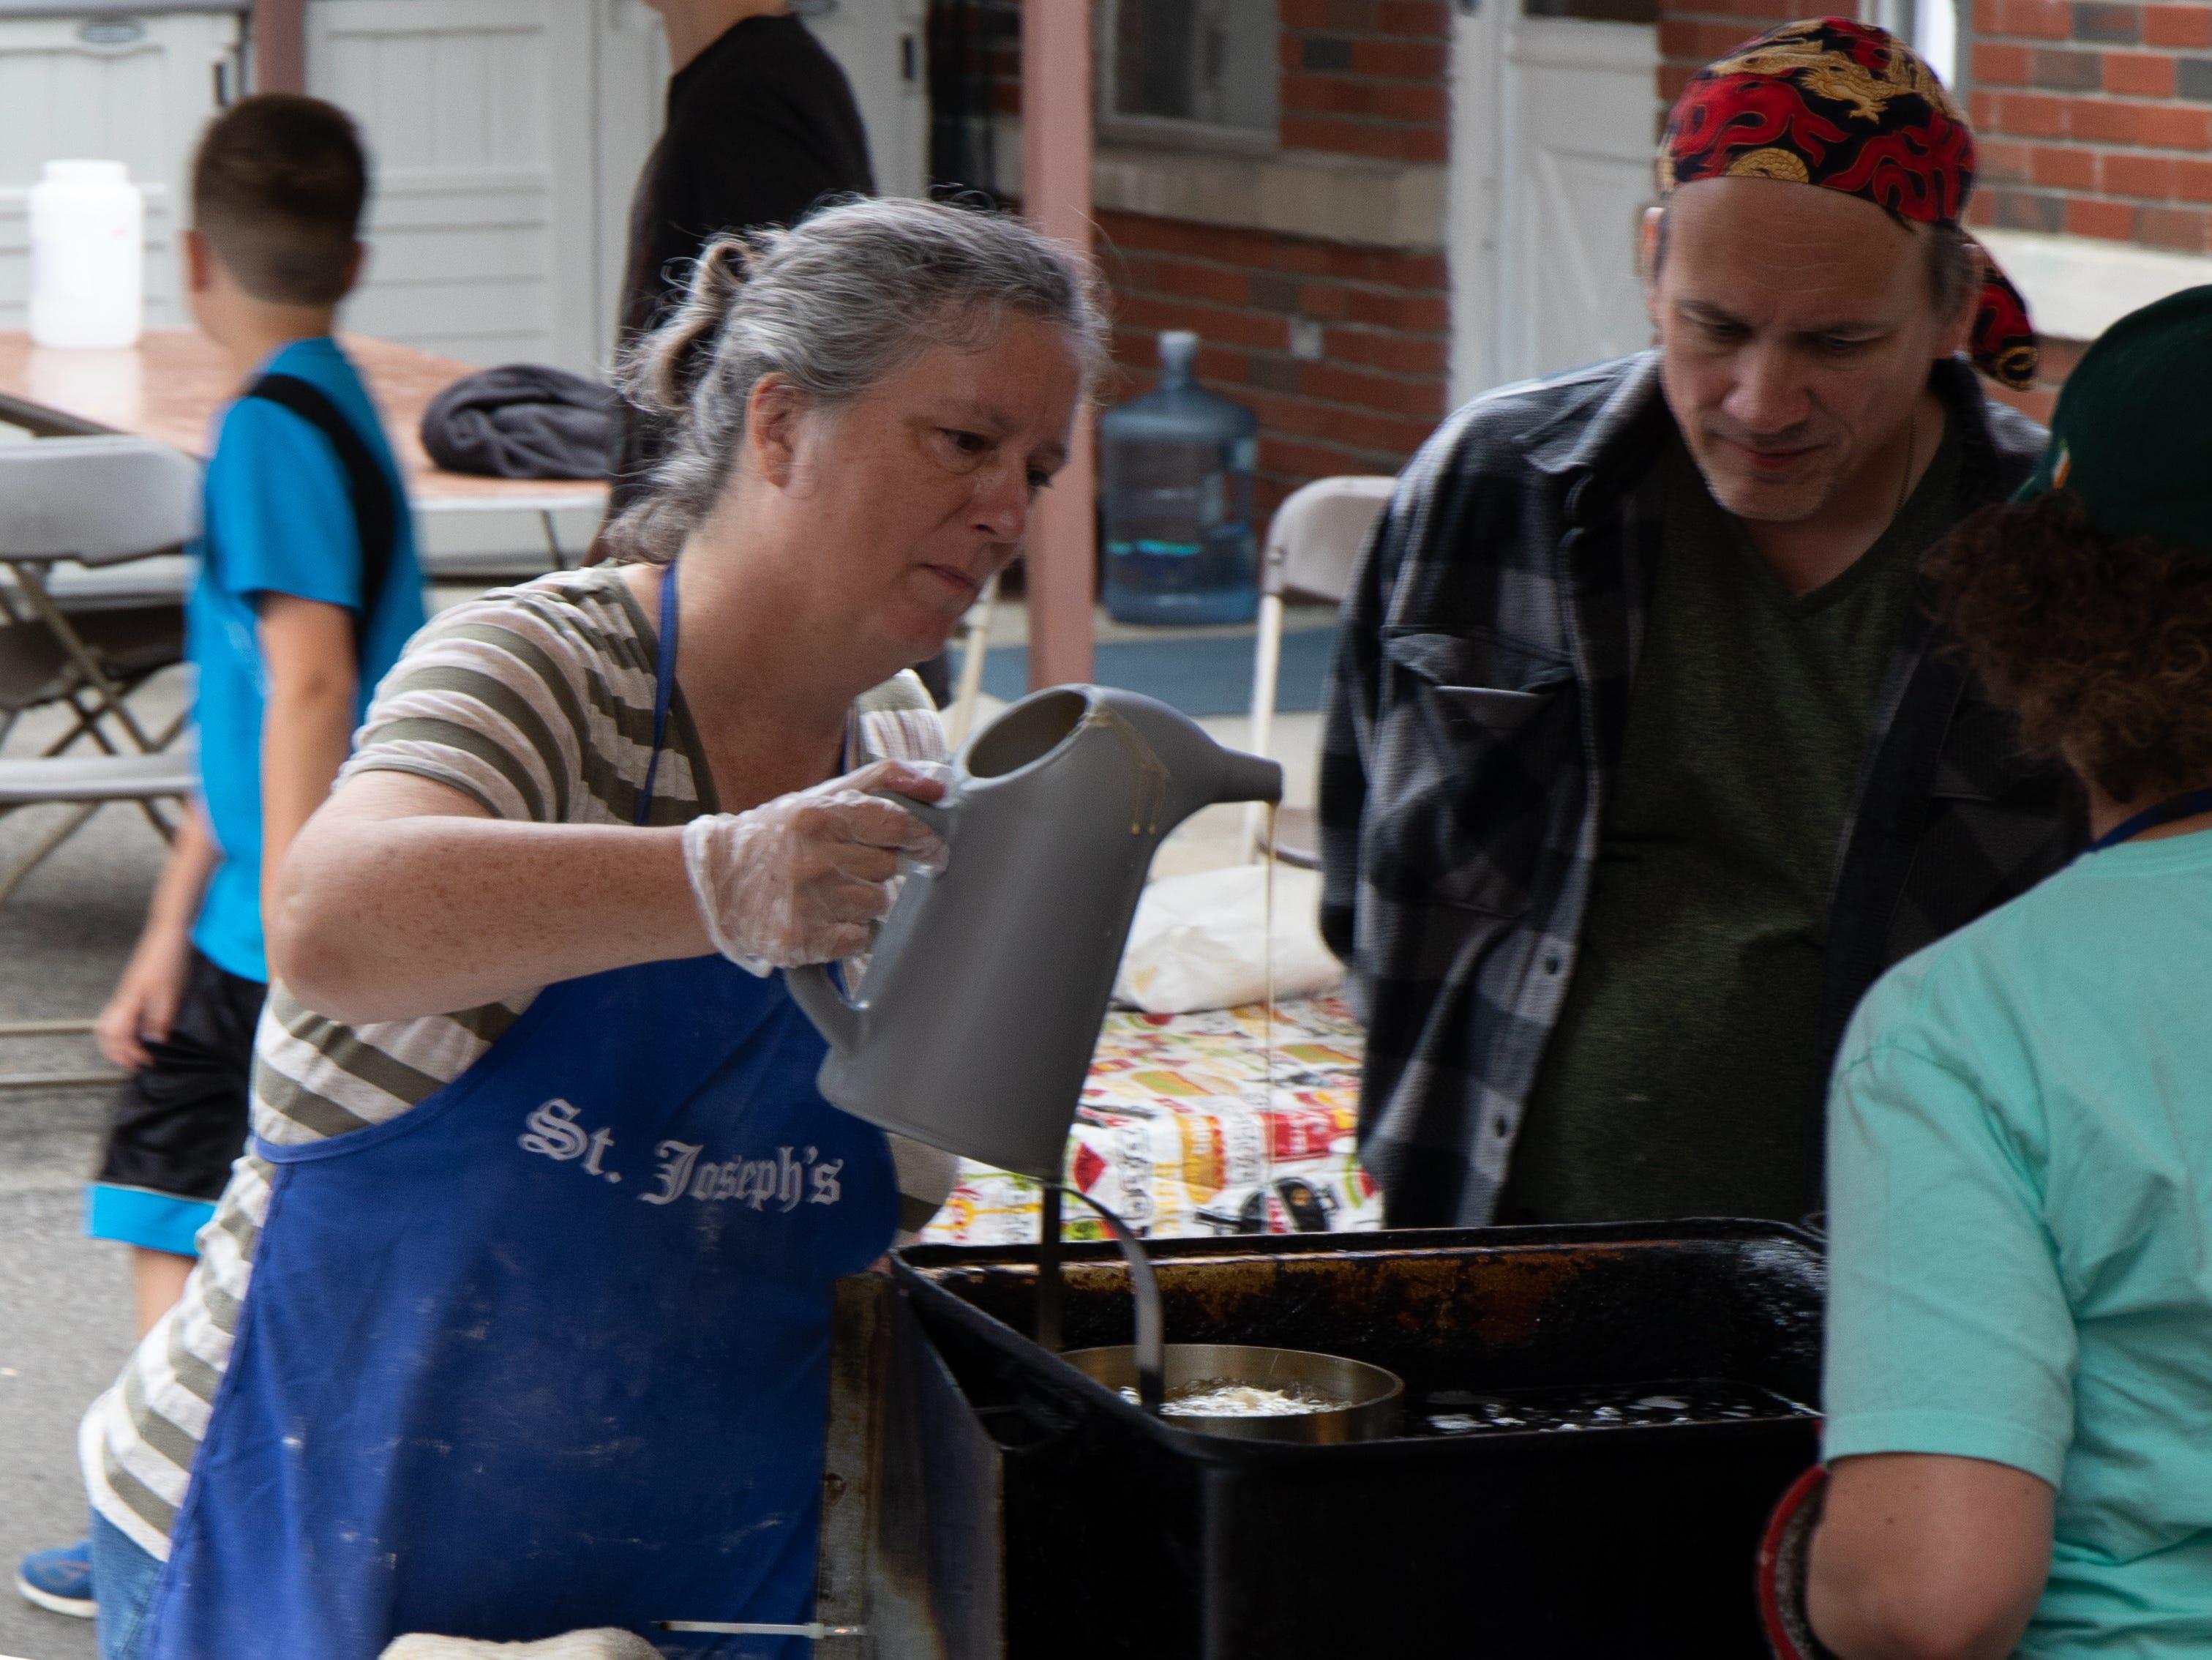 St. Joseph's Bazaar was held Sept. 8, 2018 in Endicott.